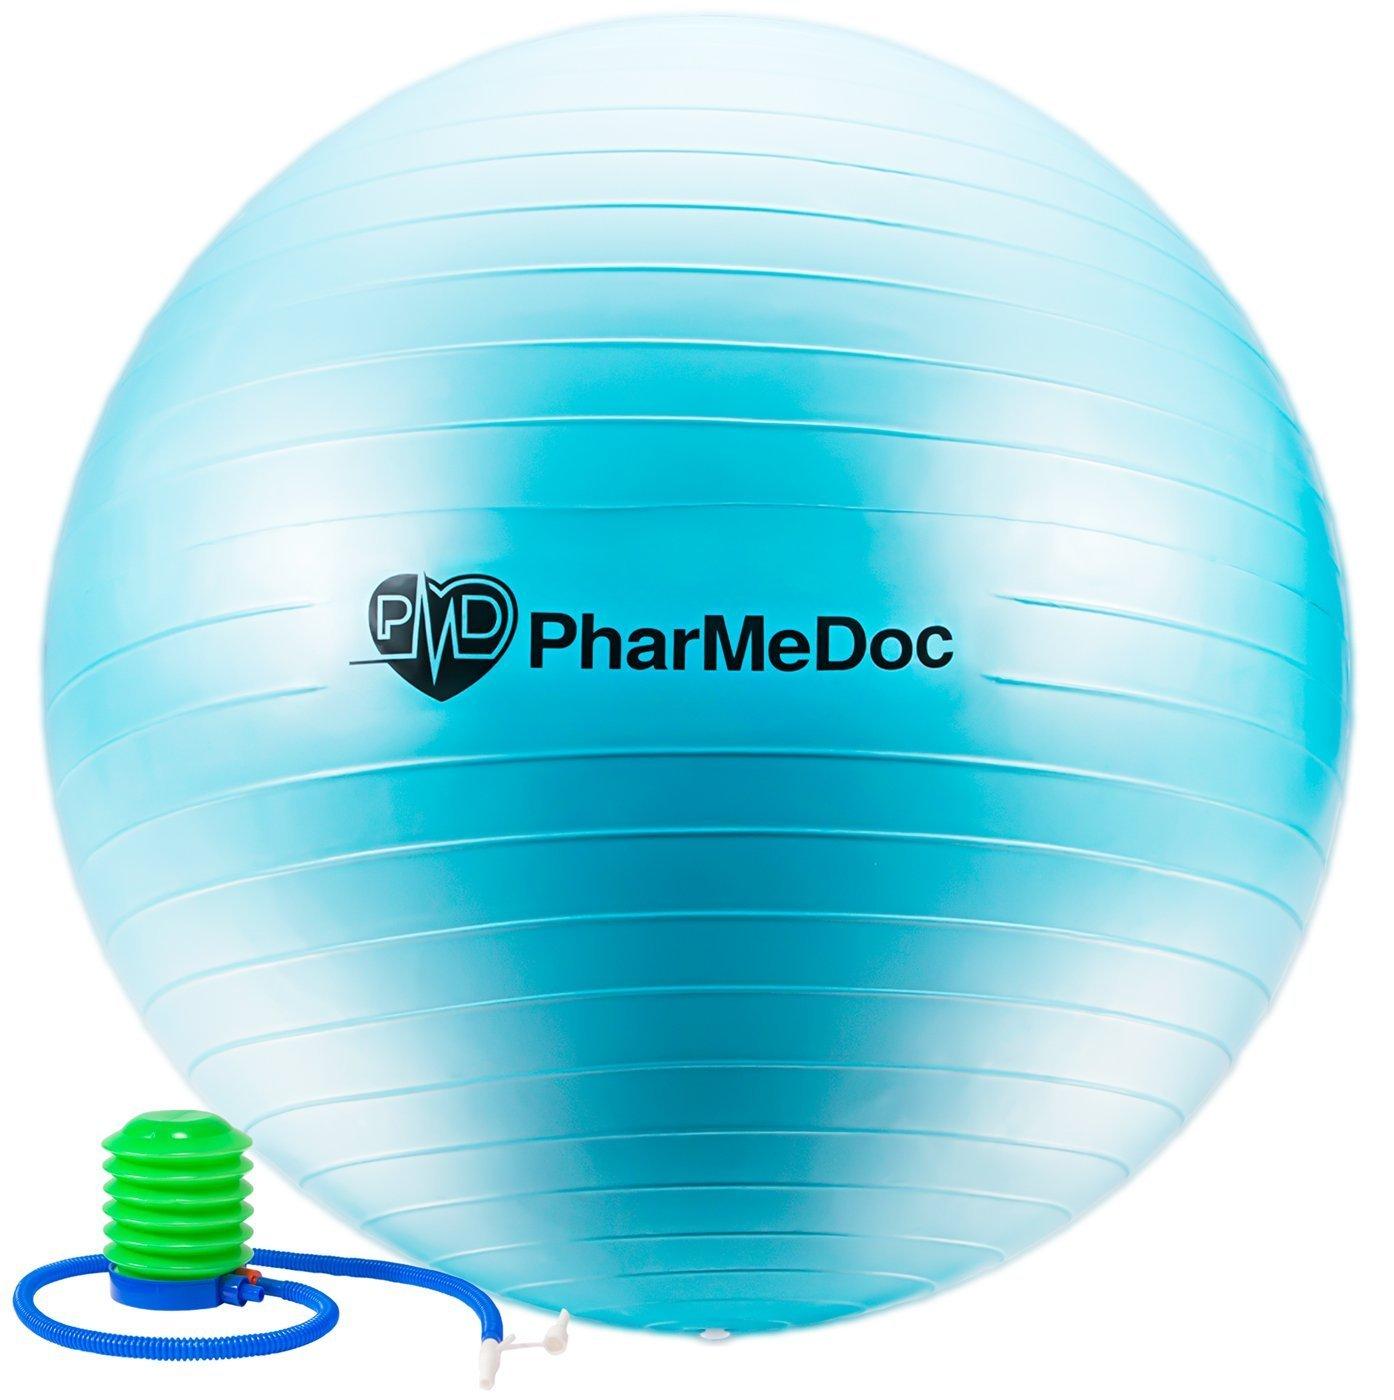 PharMeDoc Stability Ball